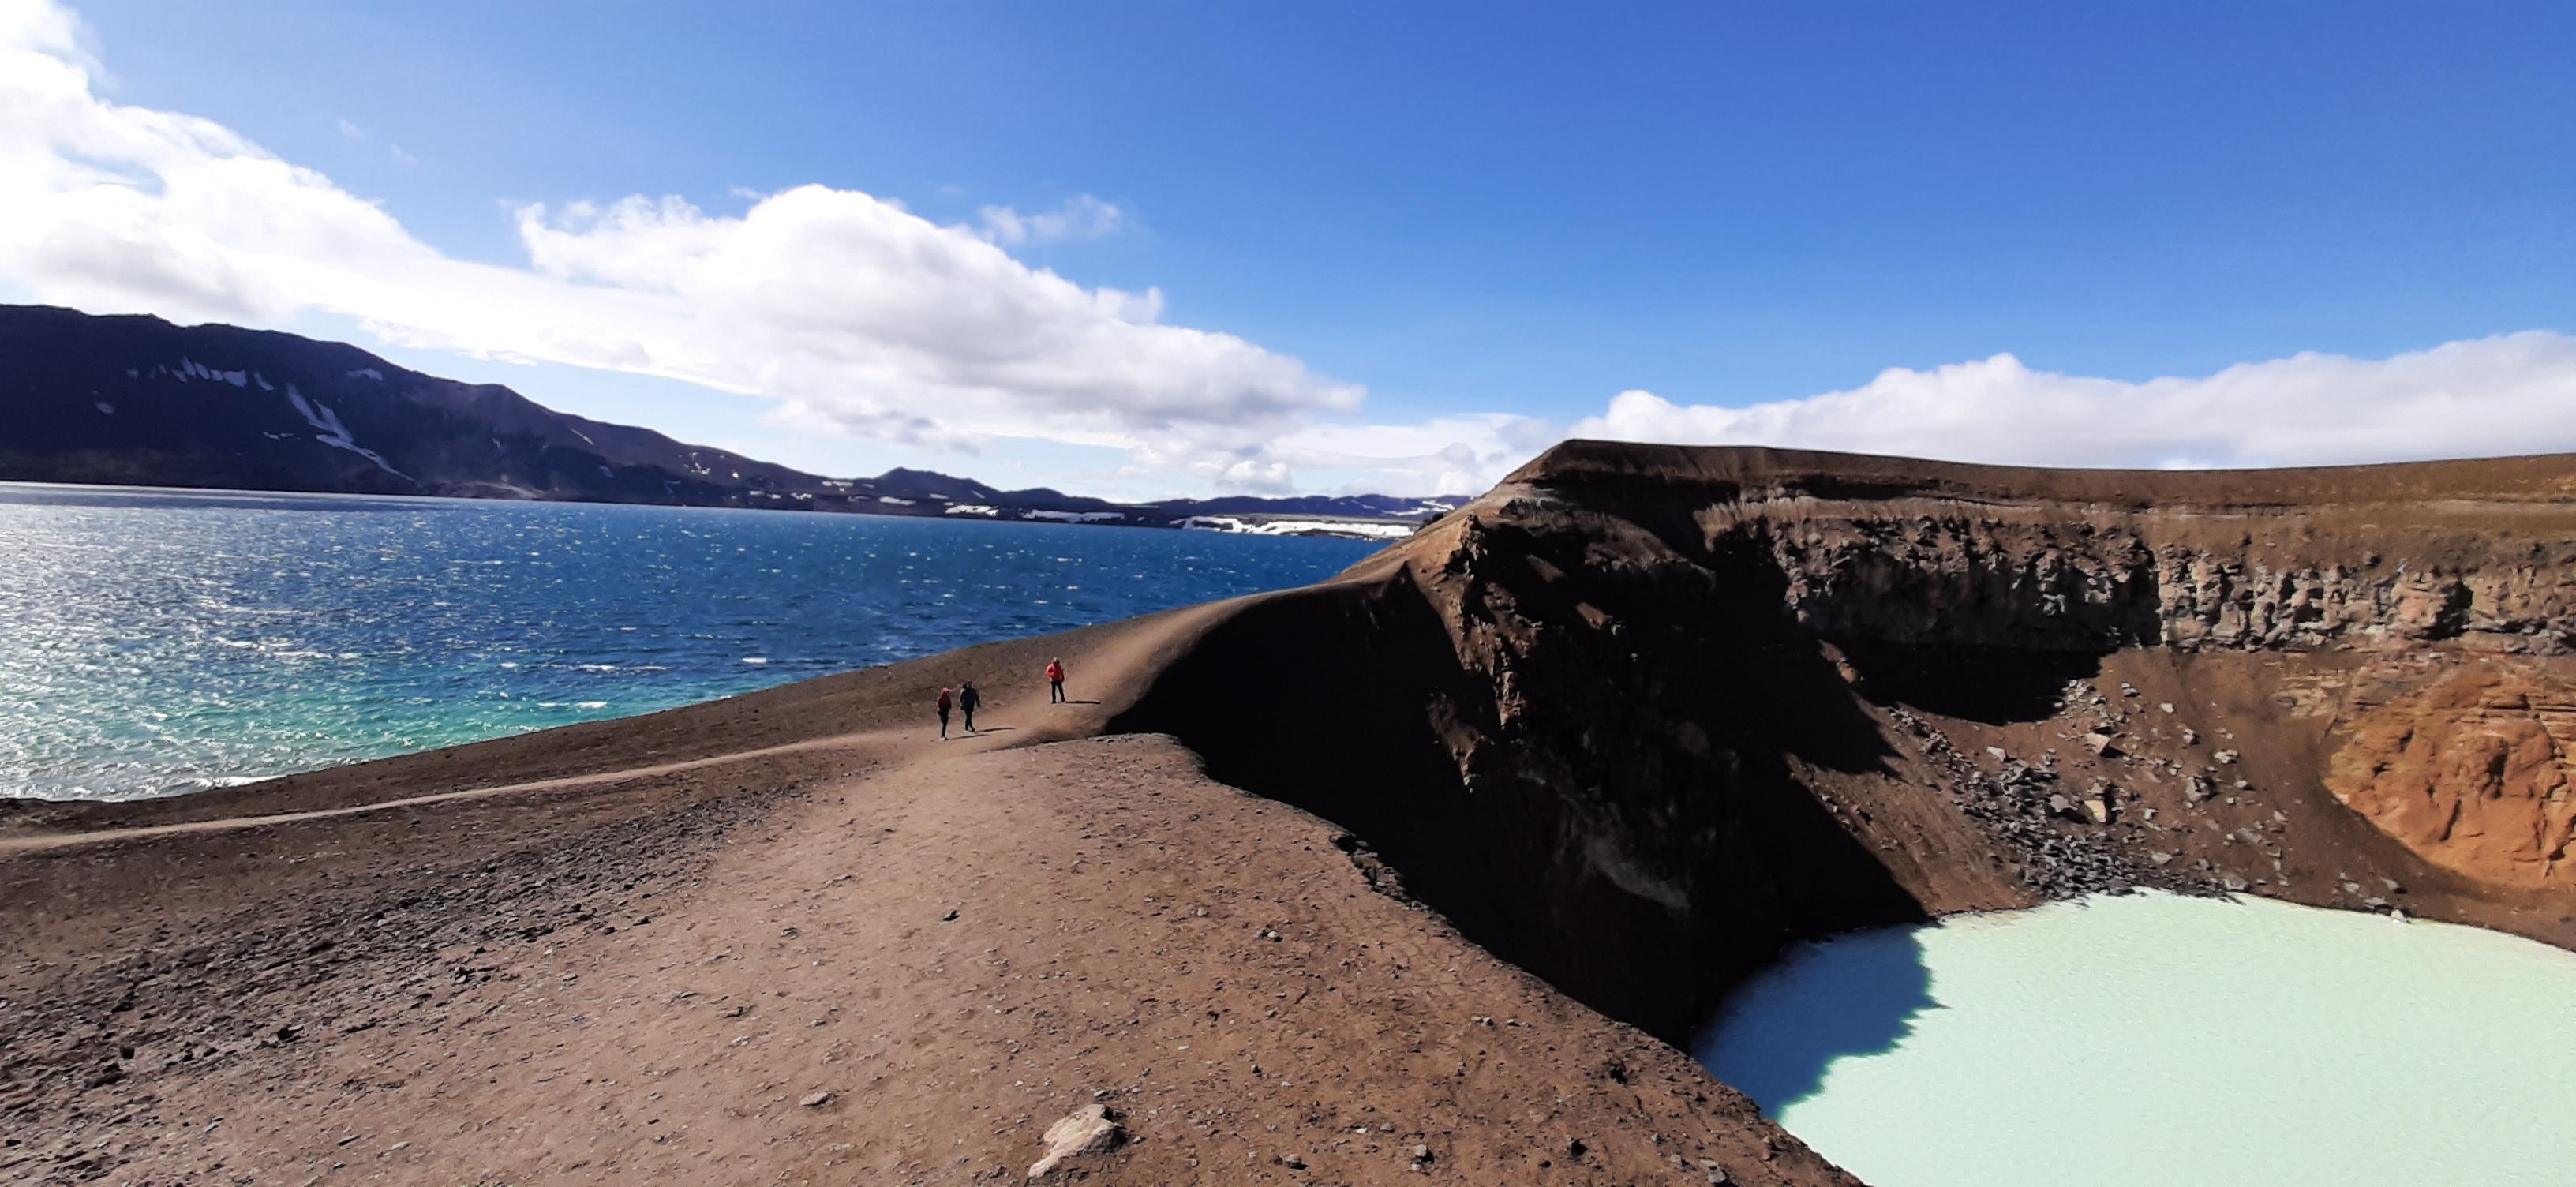 Askja Caldera, Öskjuvatn Lake & Viti Crater